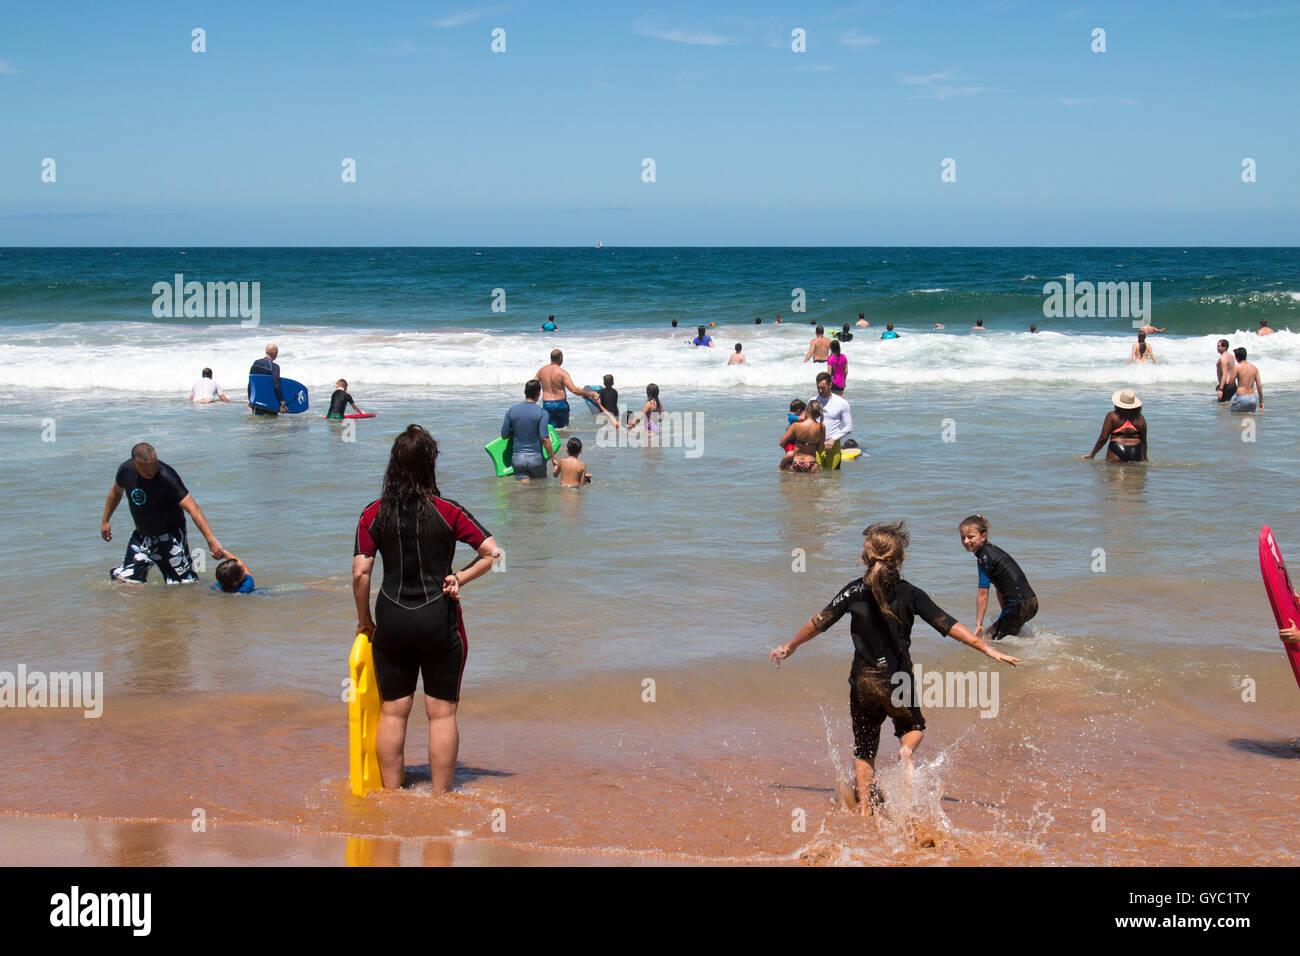 Families and children enjoying the ocean at Bilgola Beach,Sydney during summer, Australia Stock Photo